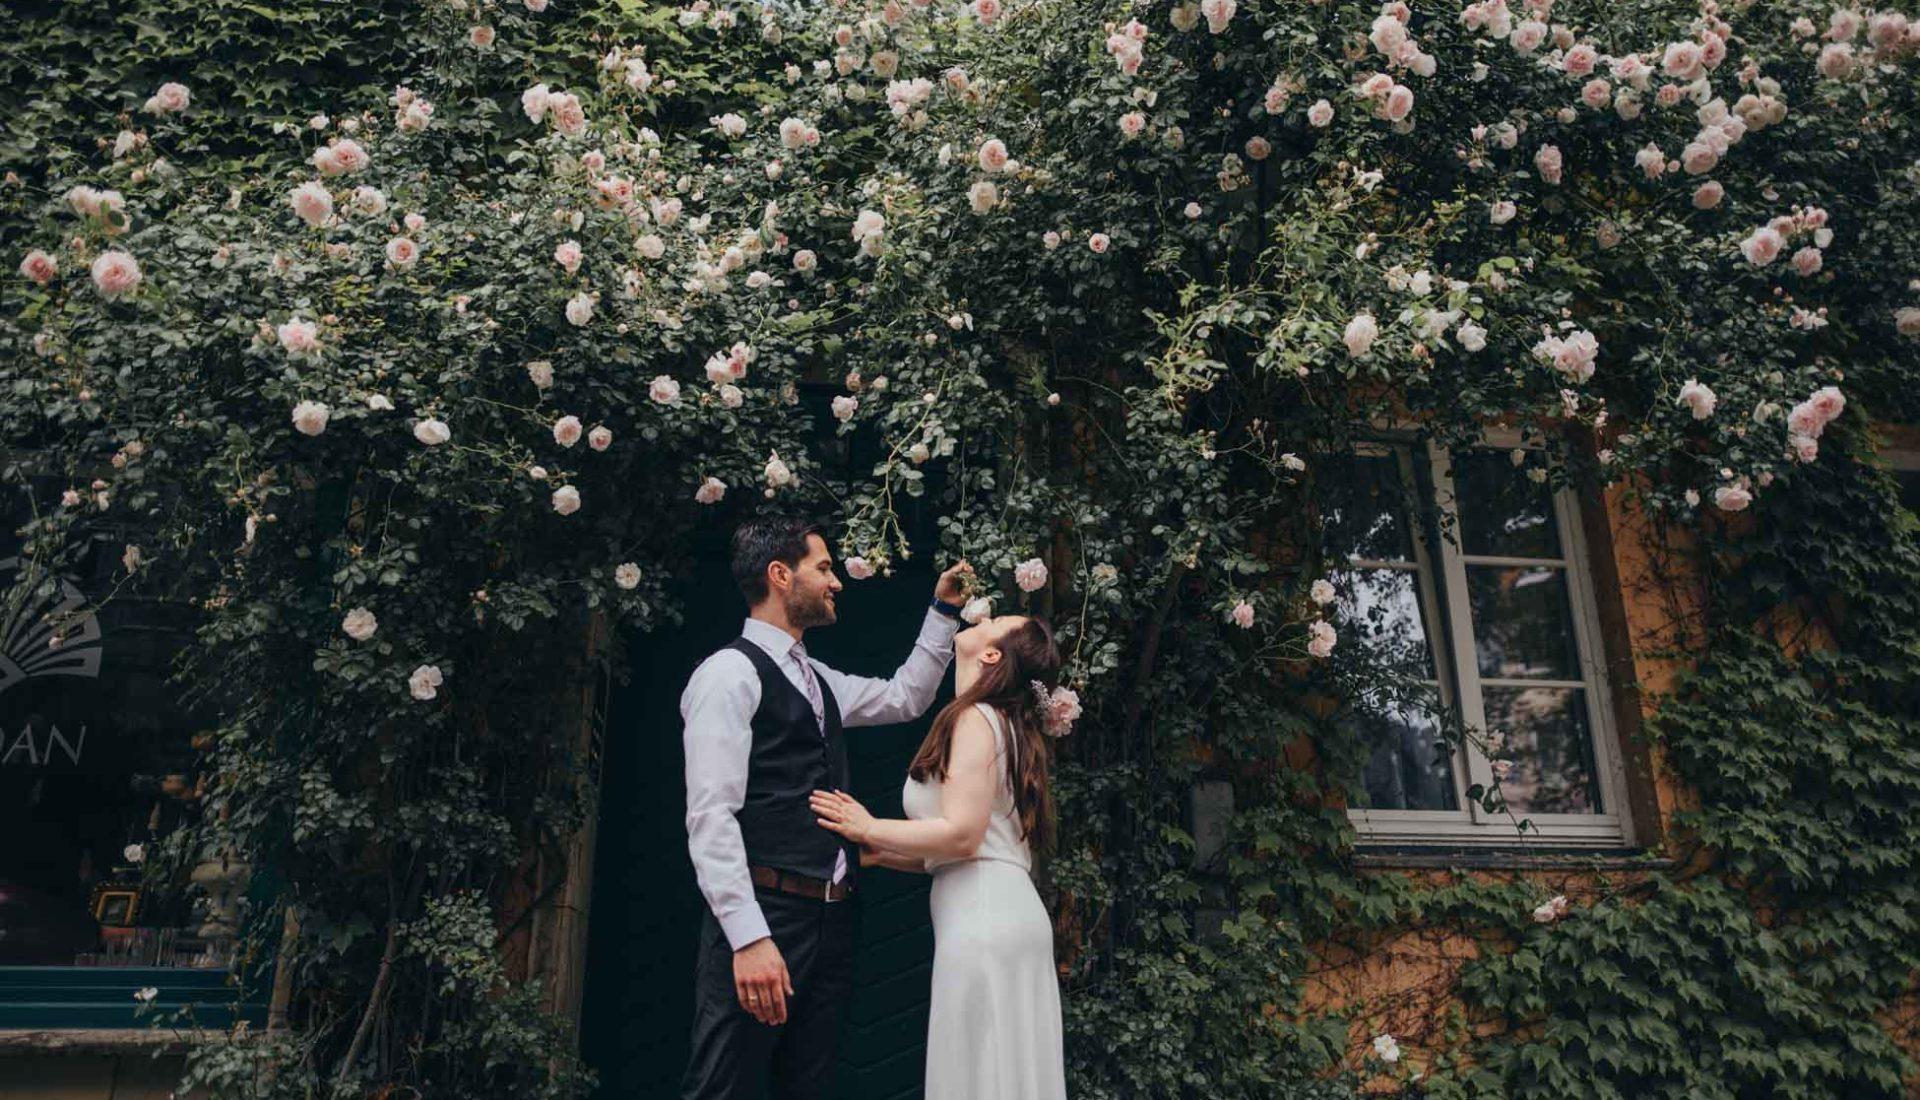 Hochzeit Hannover , Fotograf Hannover